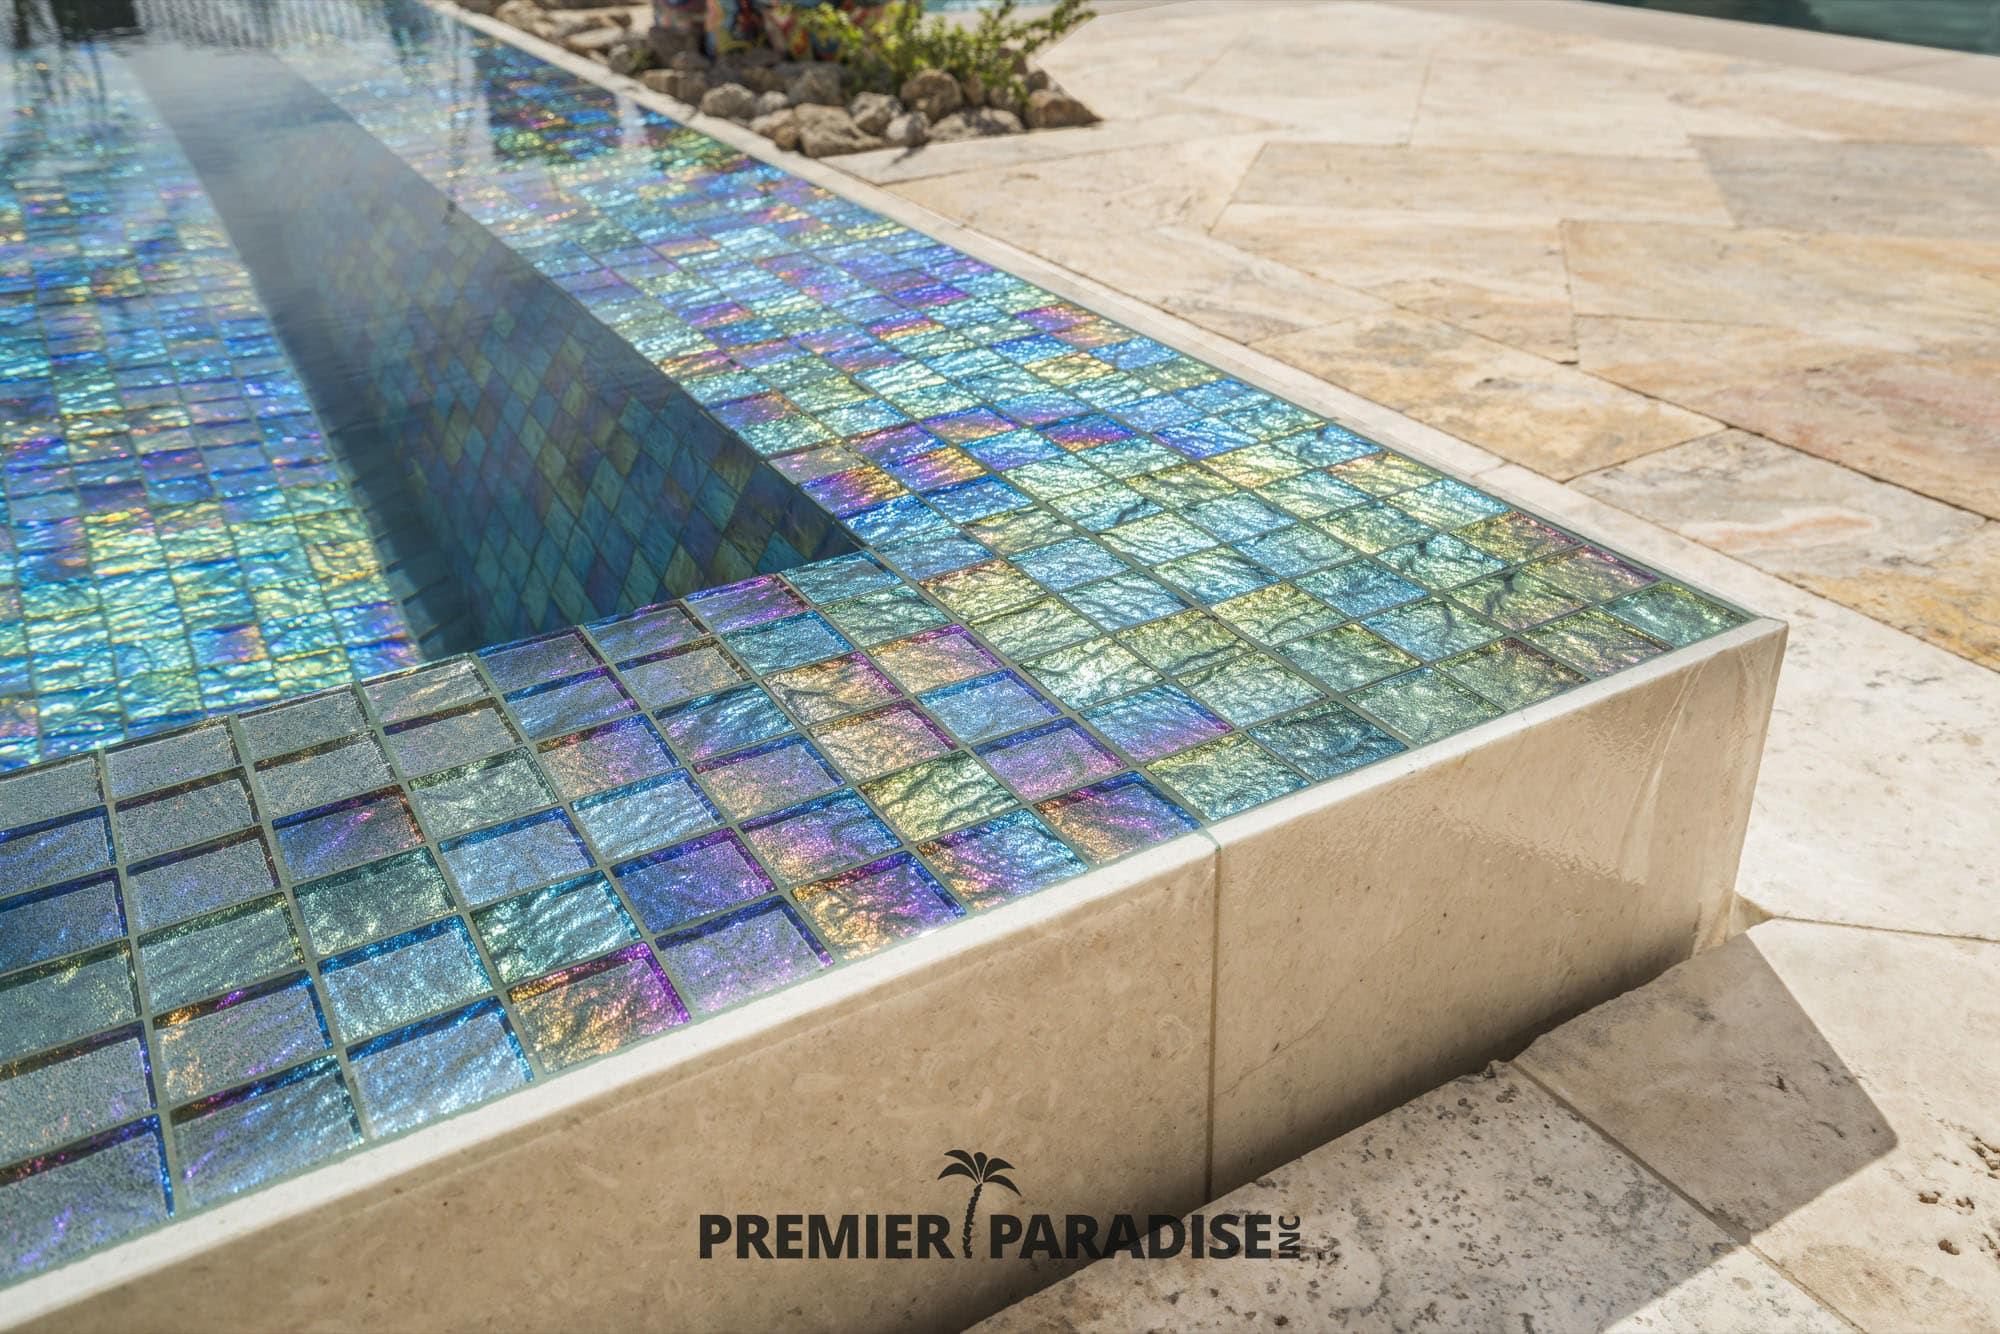 pool builder phoenix custom glass tile spa hot tub design gallery premier paradise inc 9 premier paradise inc